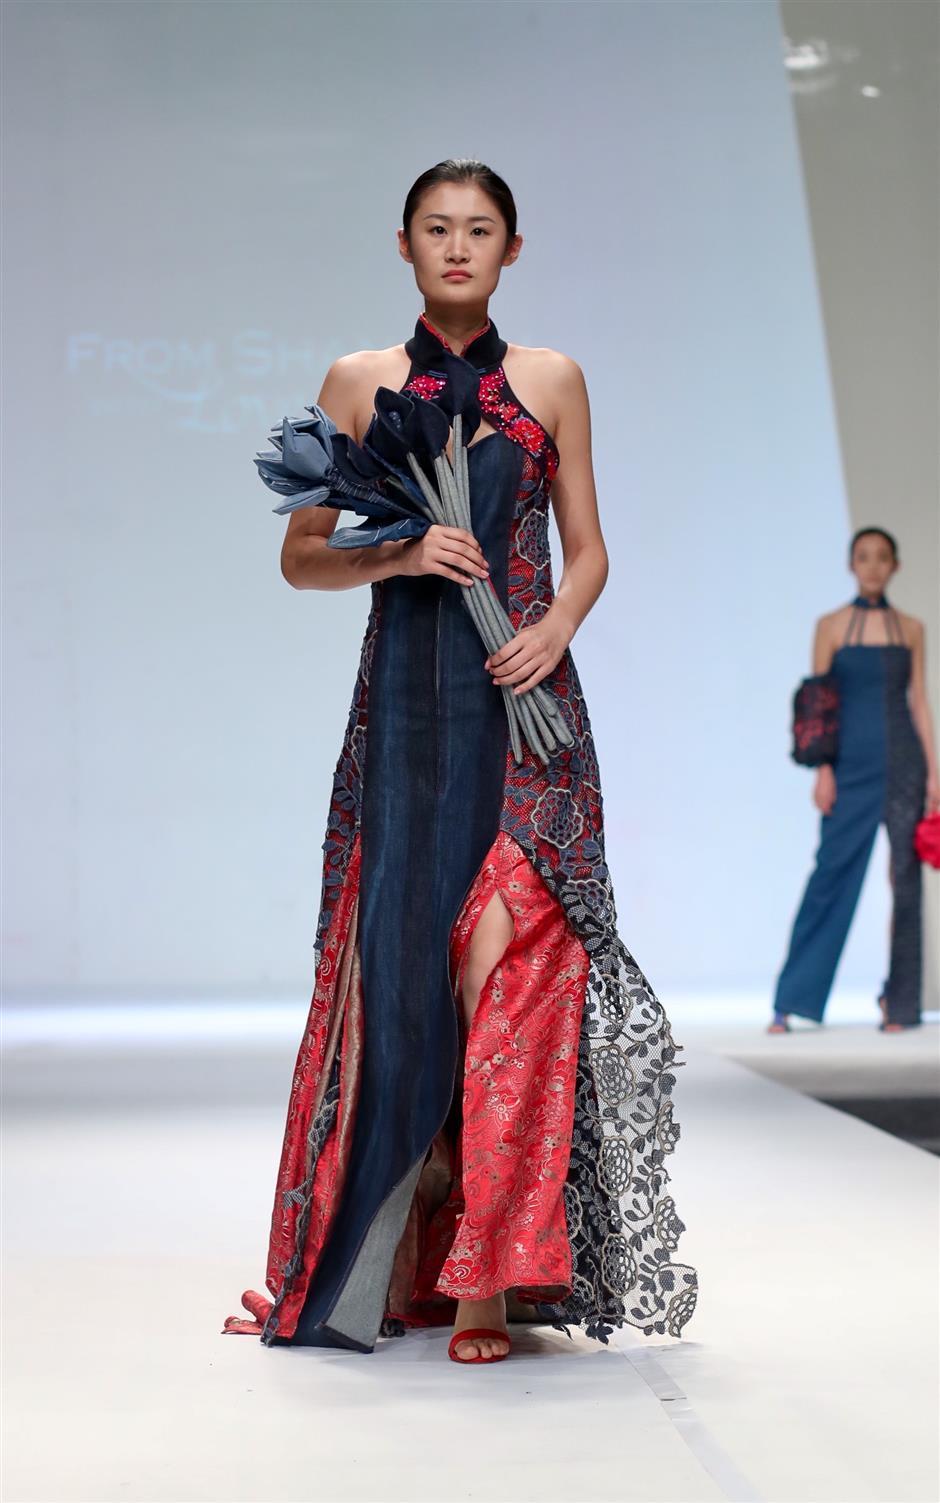 Shanghaiculture, fashion and technology comestoEdinburgh